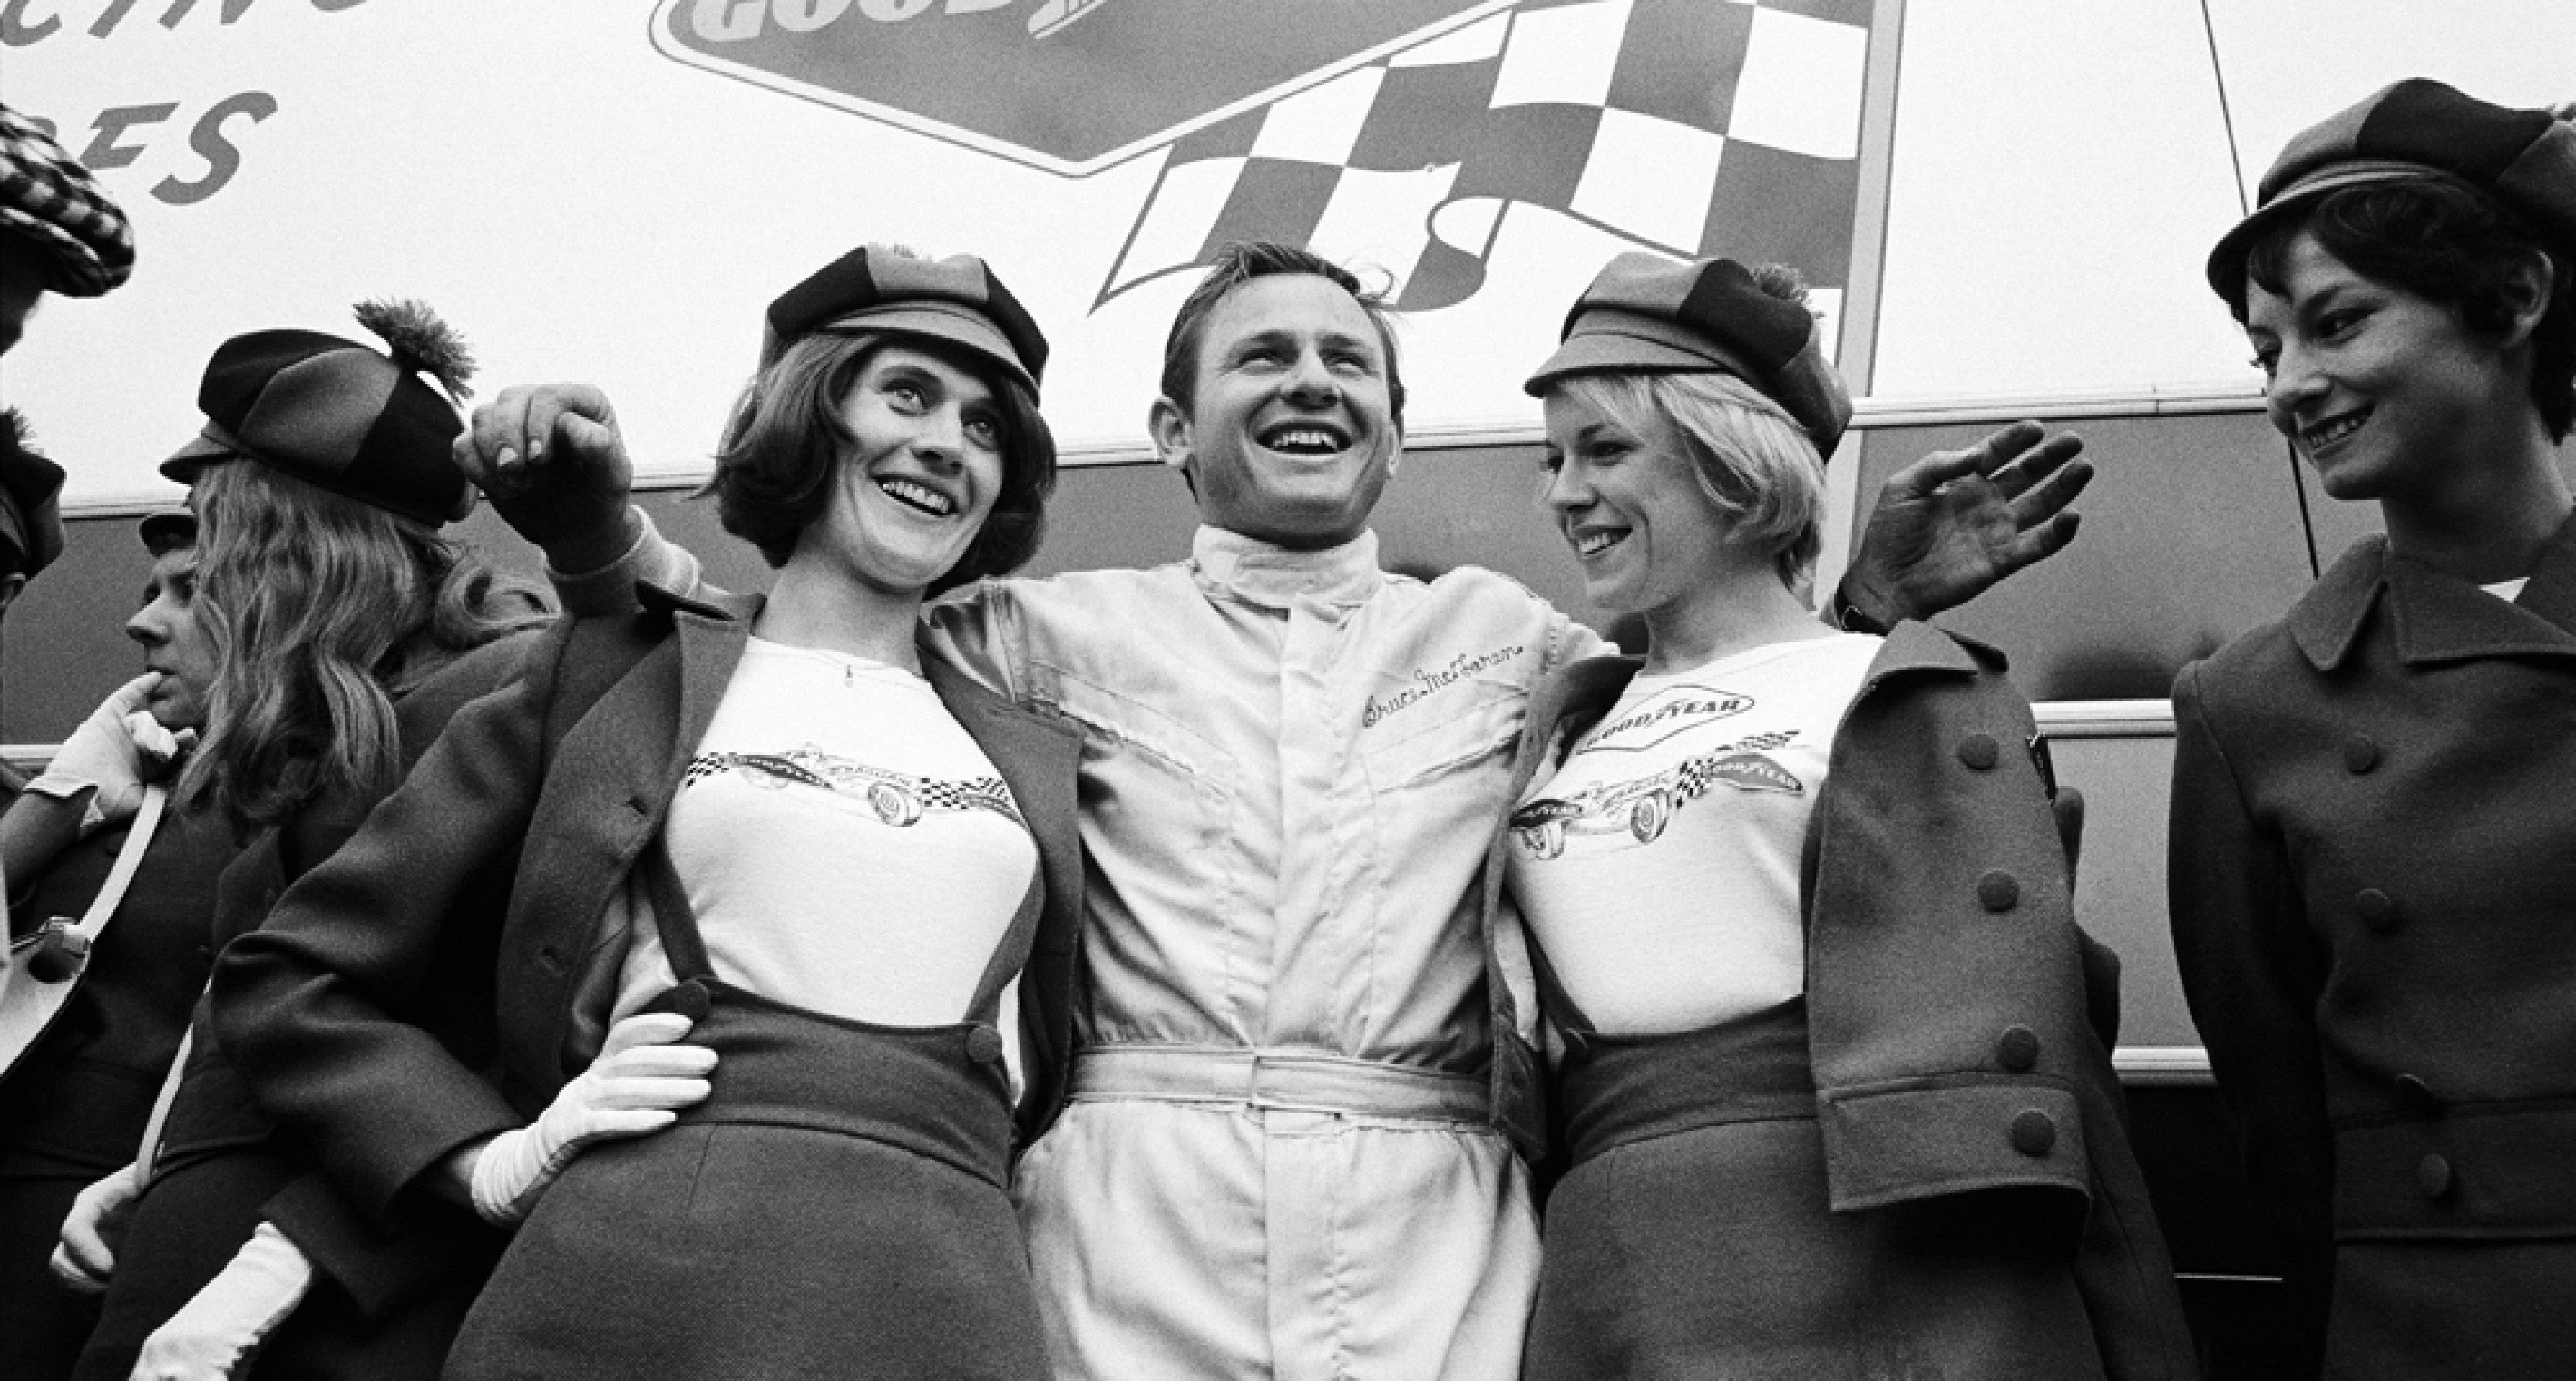 Bruce McLaren poses with his sponsor Dunlop's advertising ladies, 24h Le Mans 1967, France, Le Mans, 10 June 1967. (Photo by Rainer W. Schlegelmilch/Getty Images)